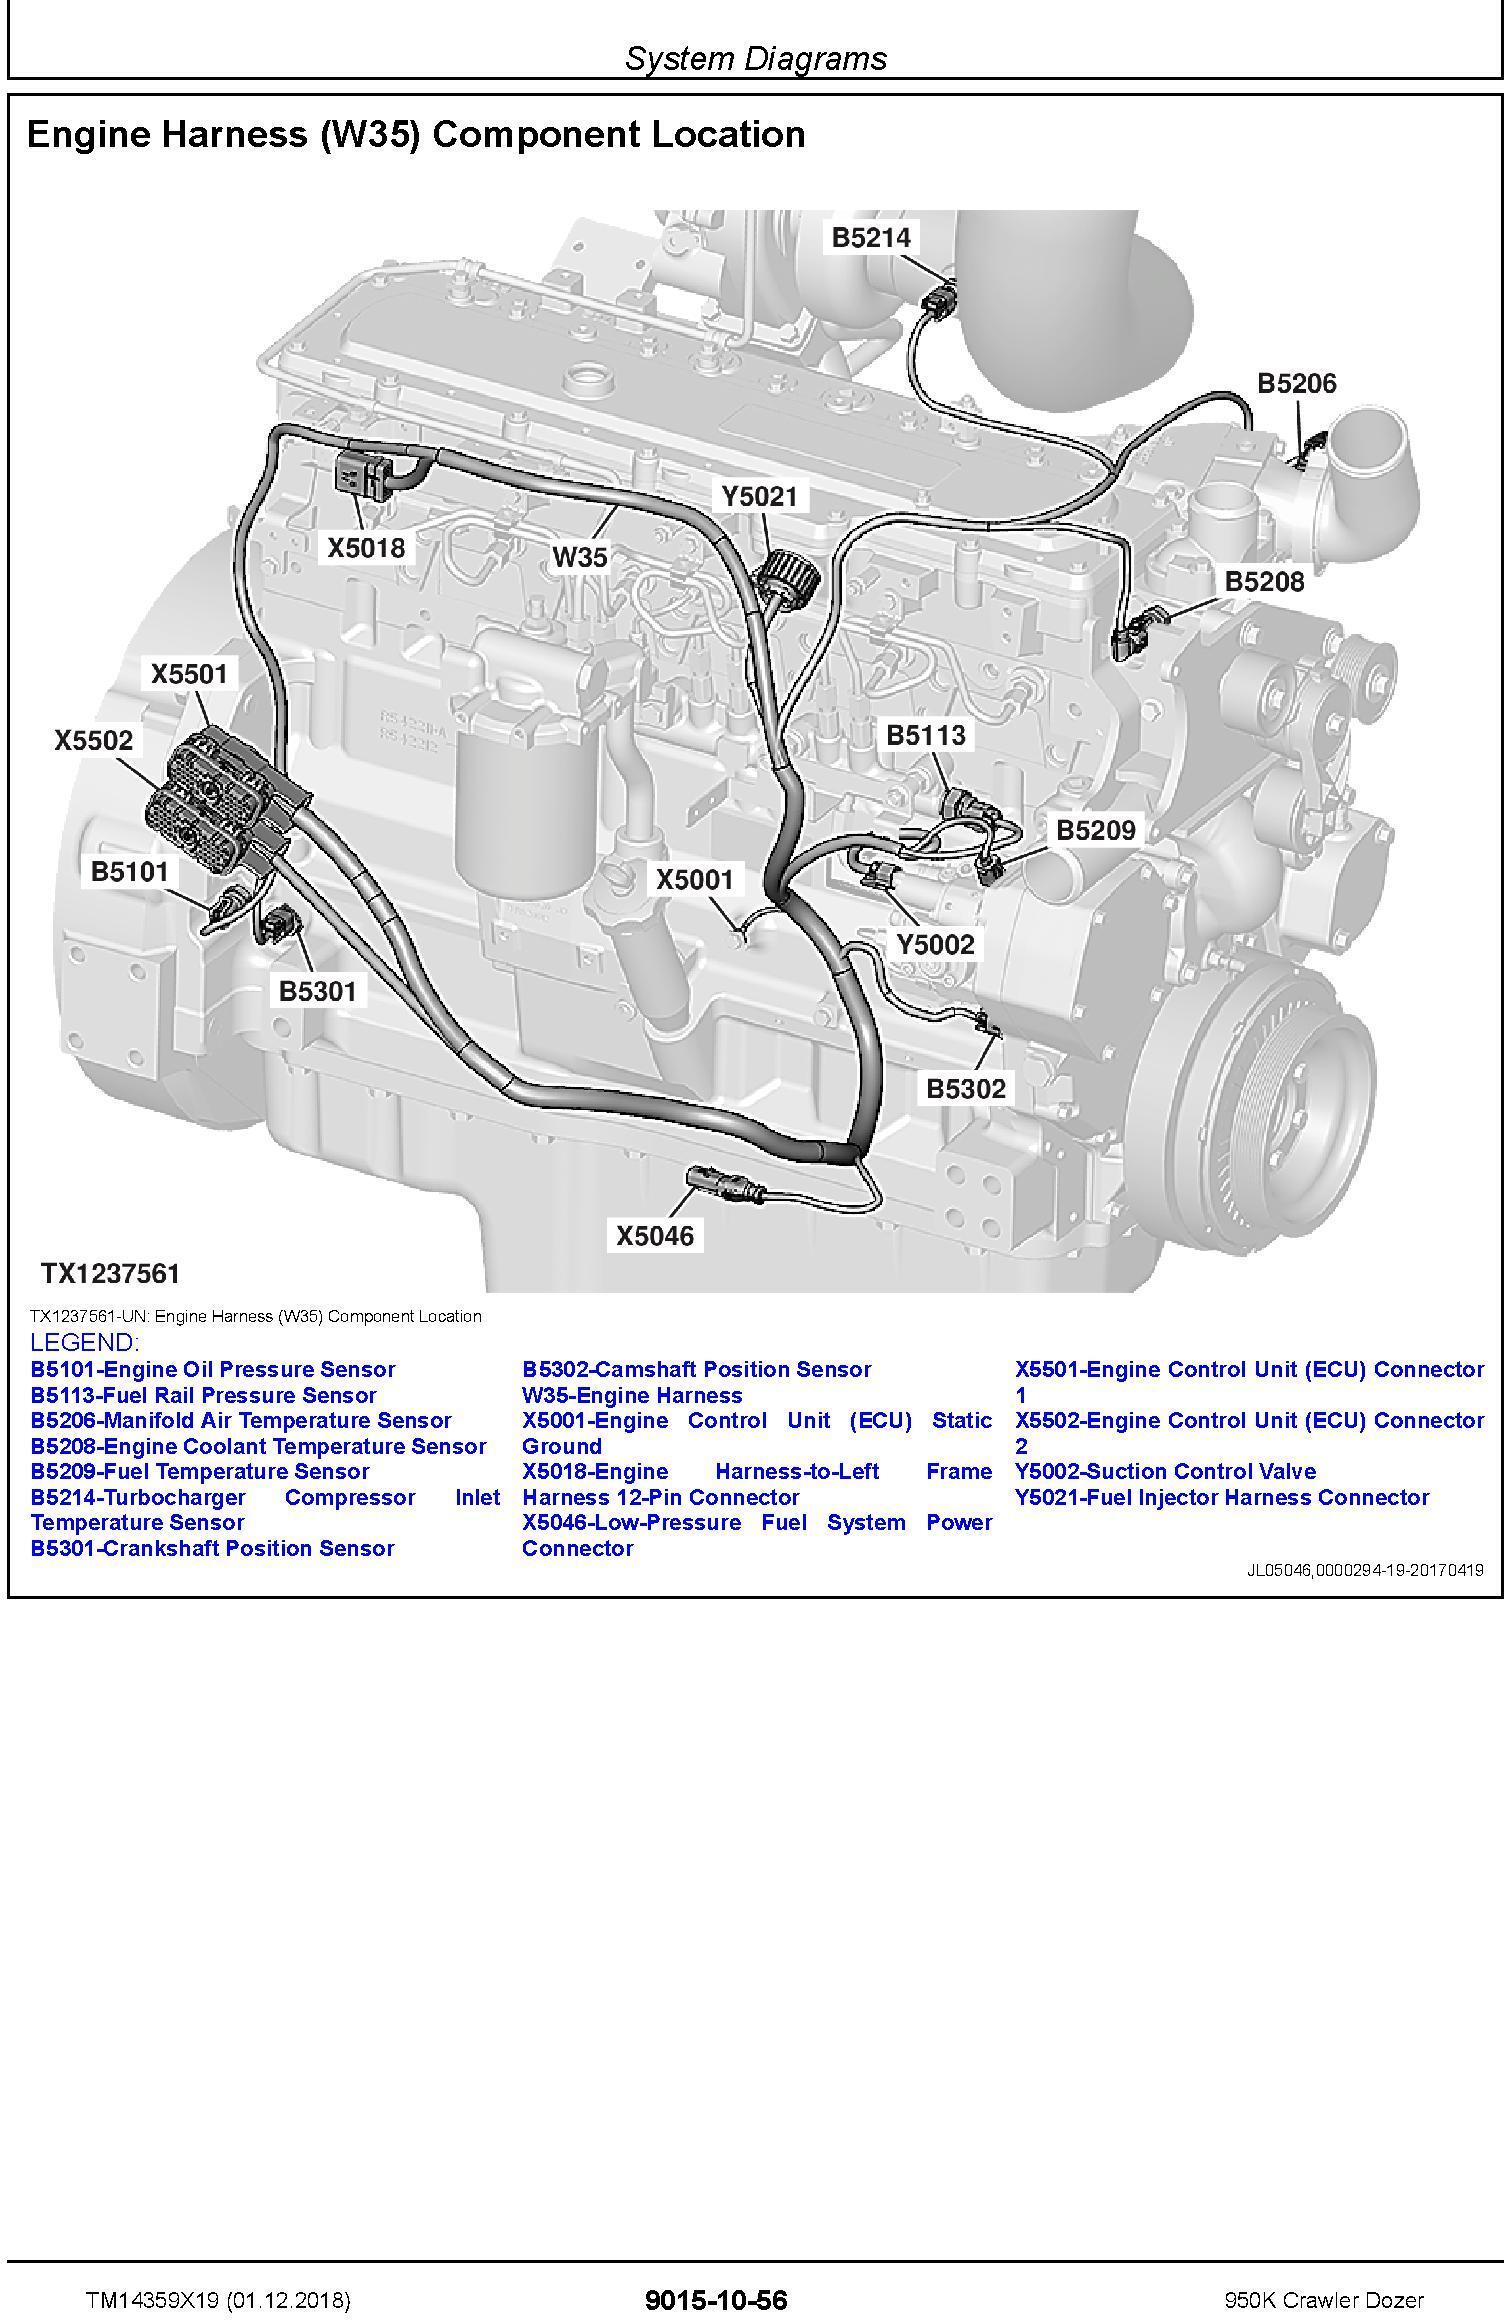 John Deere 950K Crawler Dozer Operation & Test Technical Manual (TM14359X19) - 1